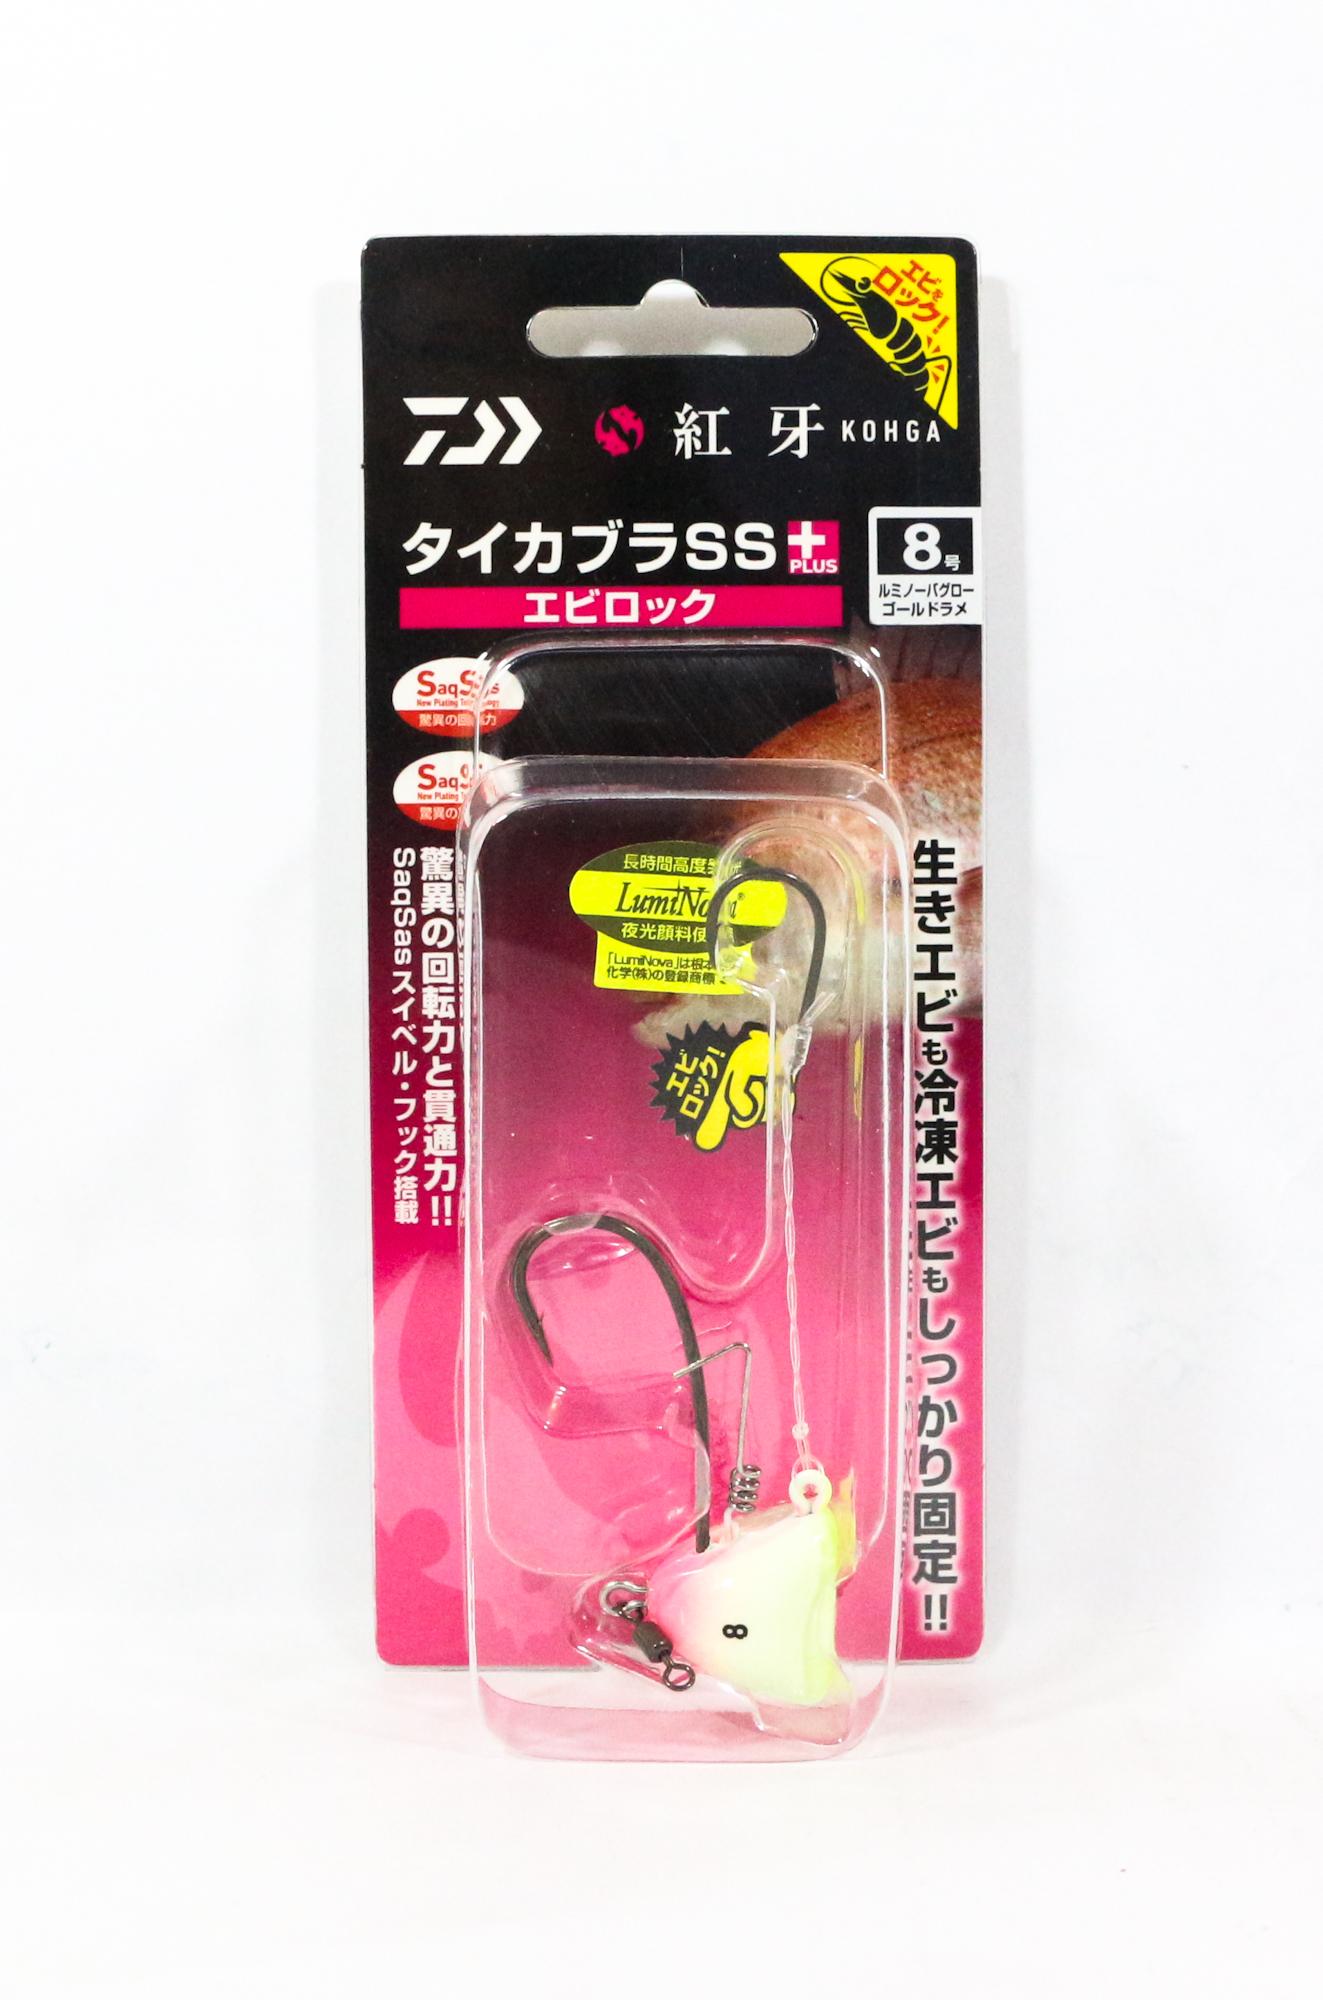 Daiwa Kabura SS+ Tenya Jig Size 8 L Glow Candy 003110